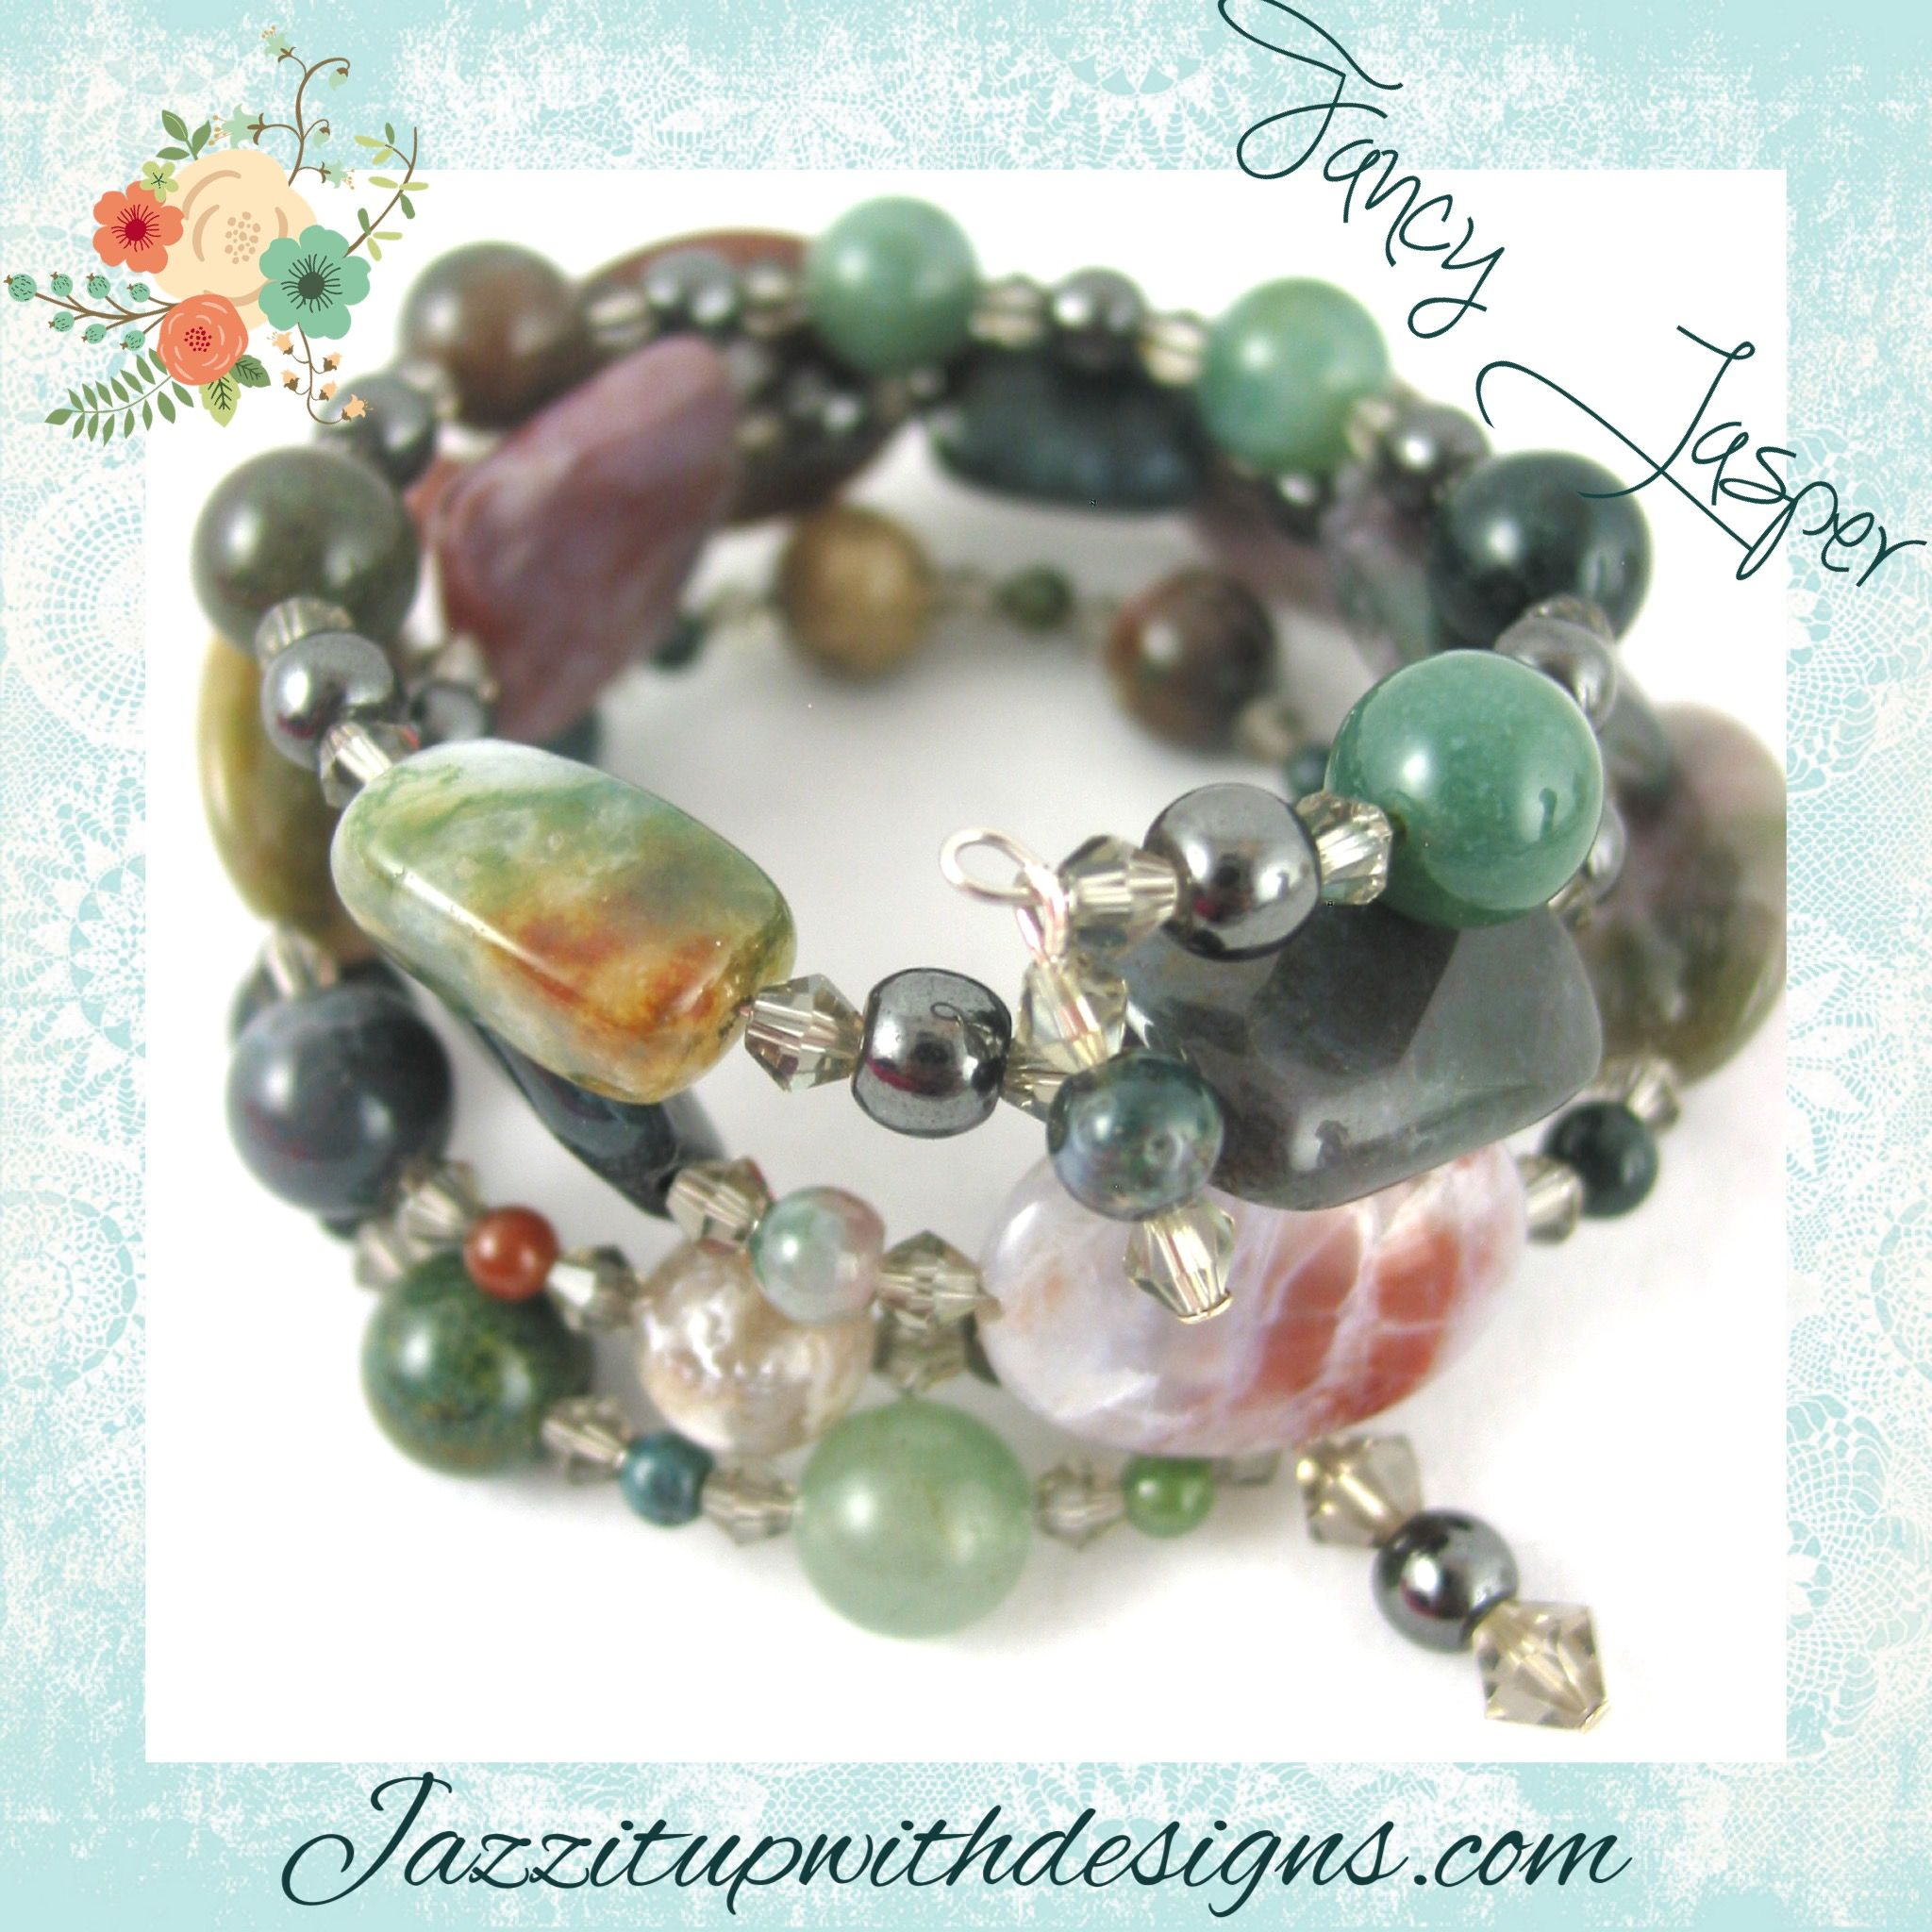 Jasper Green Brown Bracelet and Earrings Gemstone Handmade #cpromo